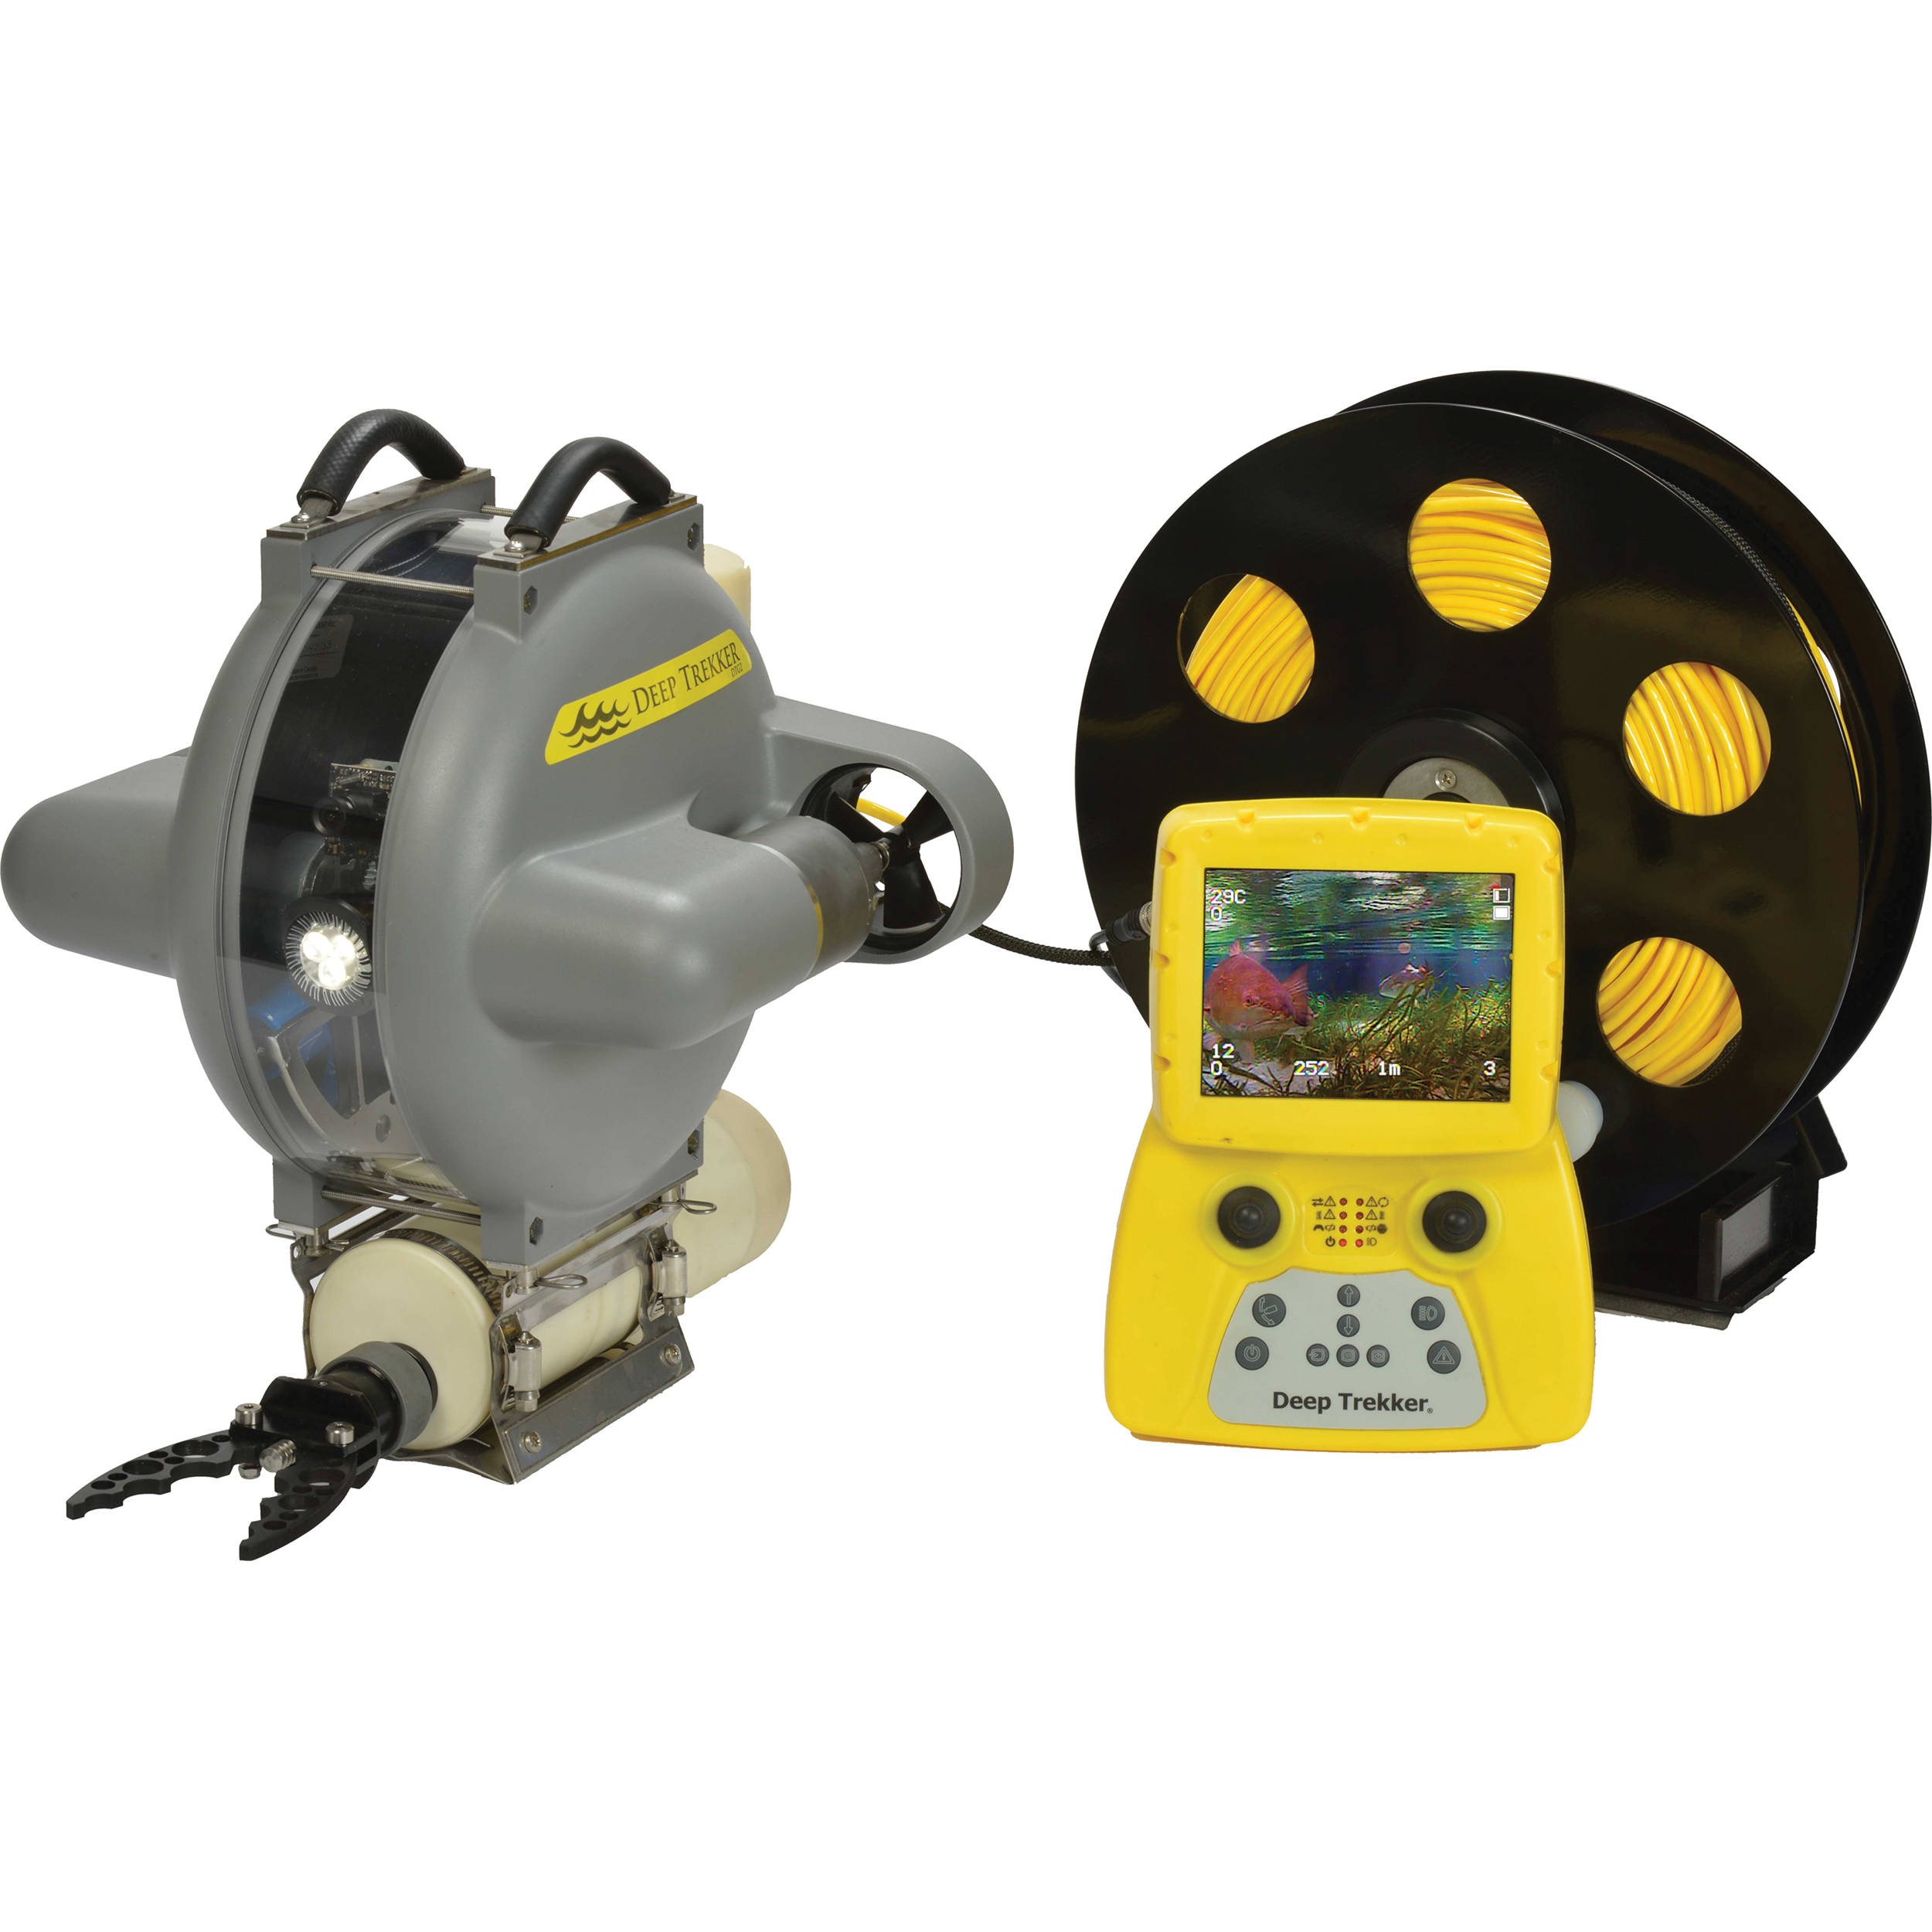 Deep Trekker Dtg2 Underwater Rov Worker Turbo Dt 0202